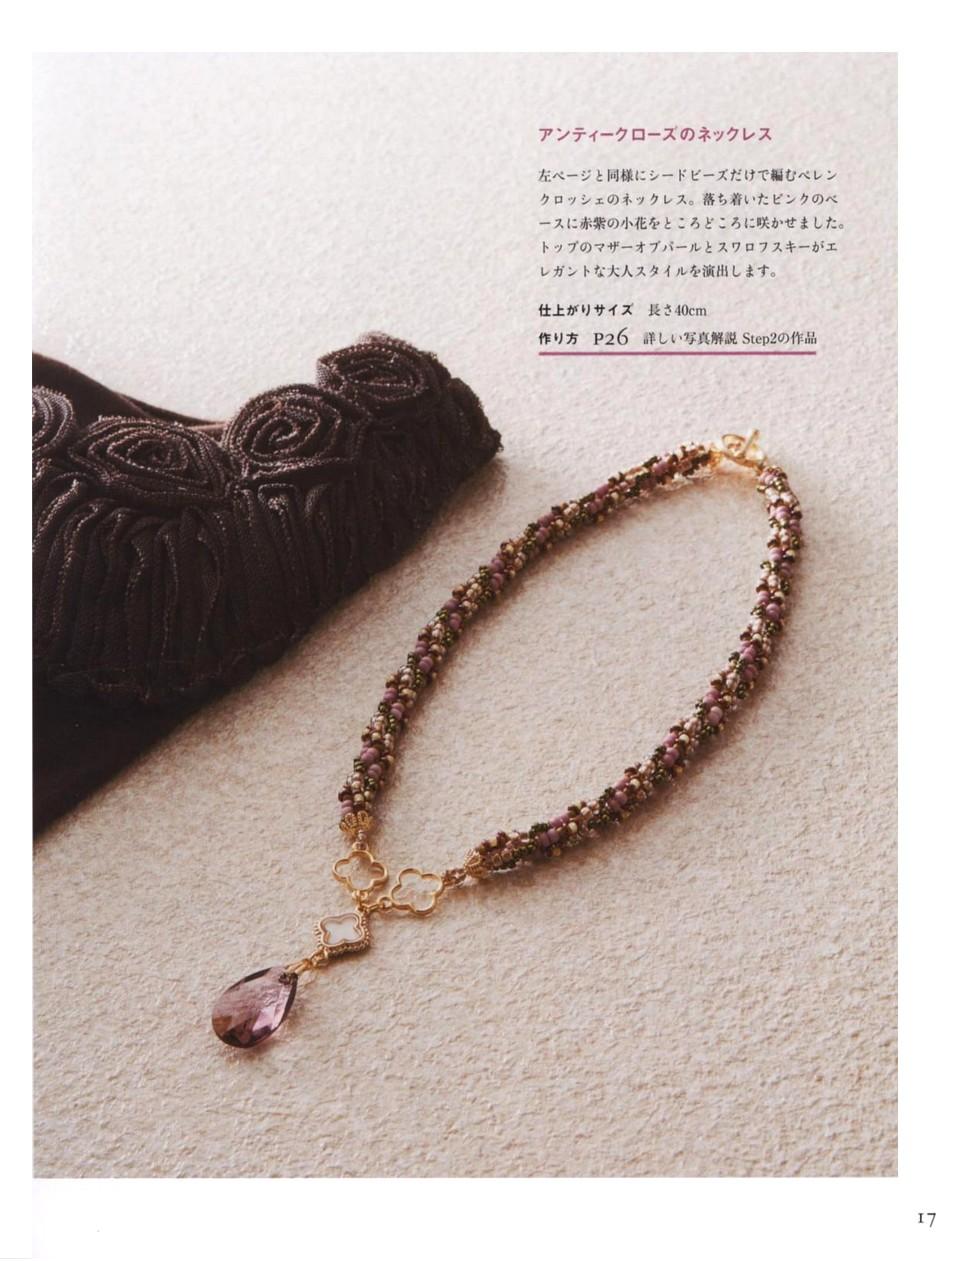 717 Beads Crochet 17-18